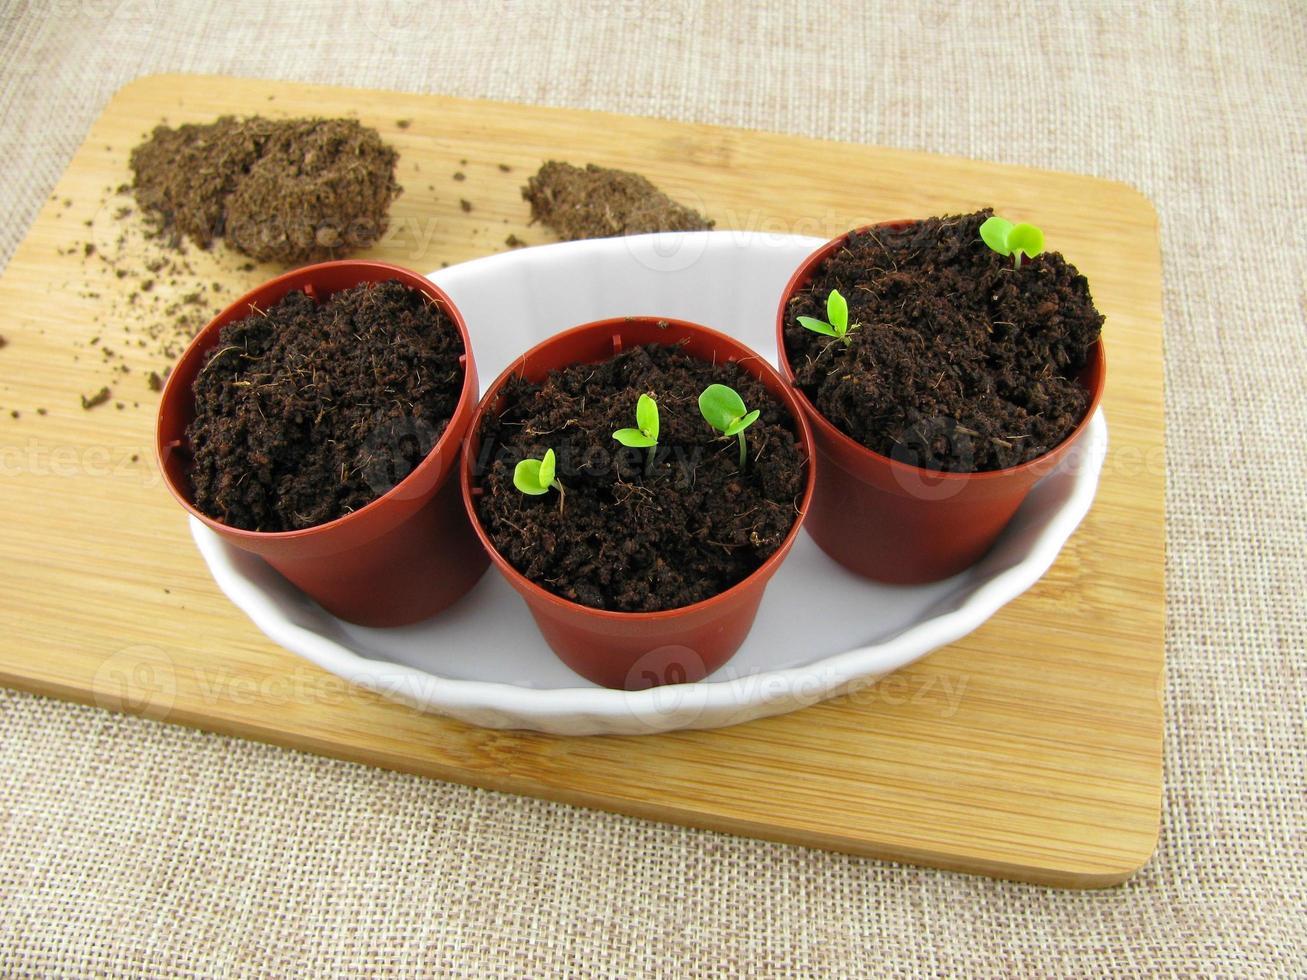 kiemplant in bloempot foto